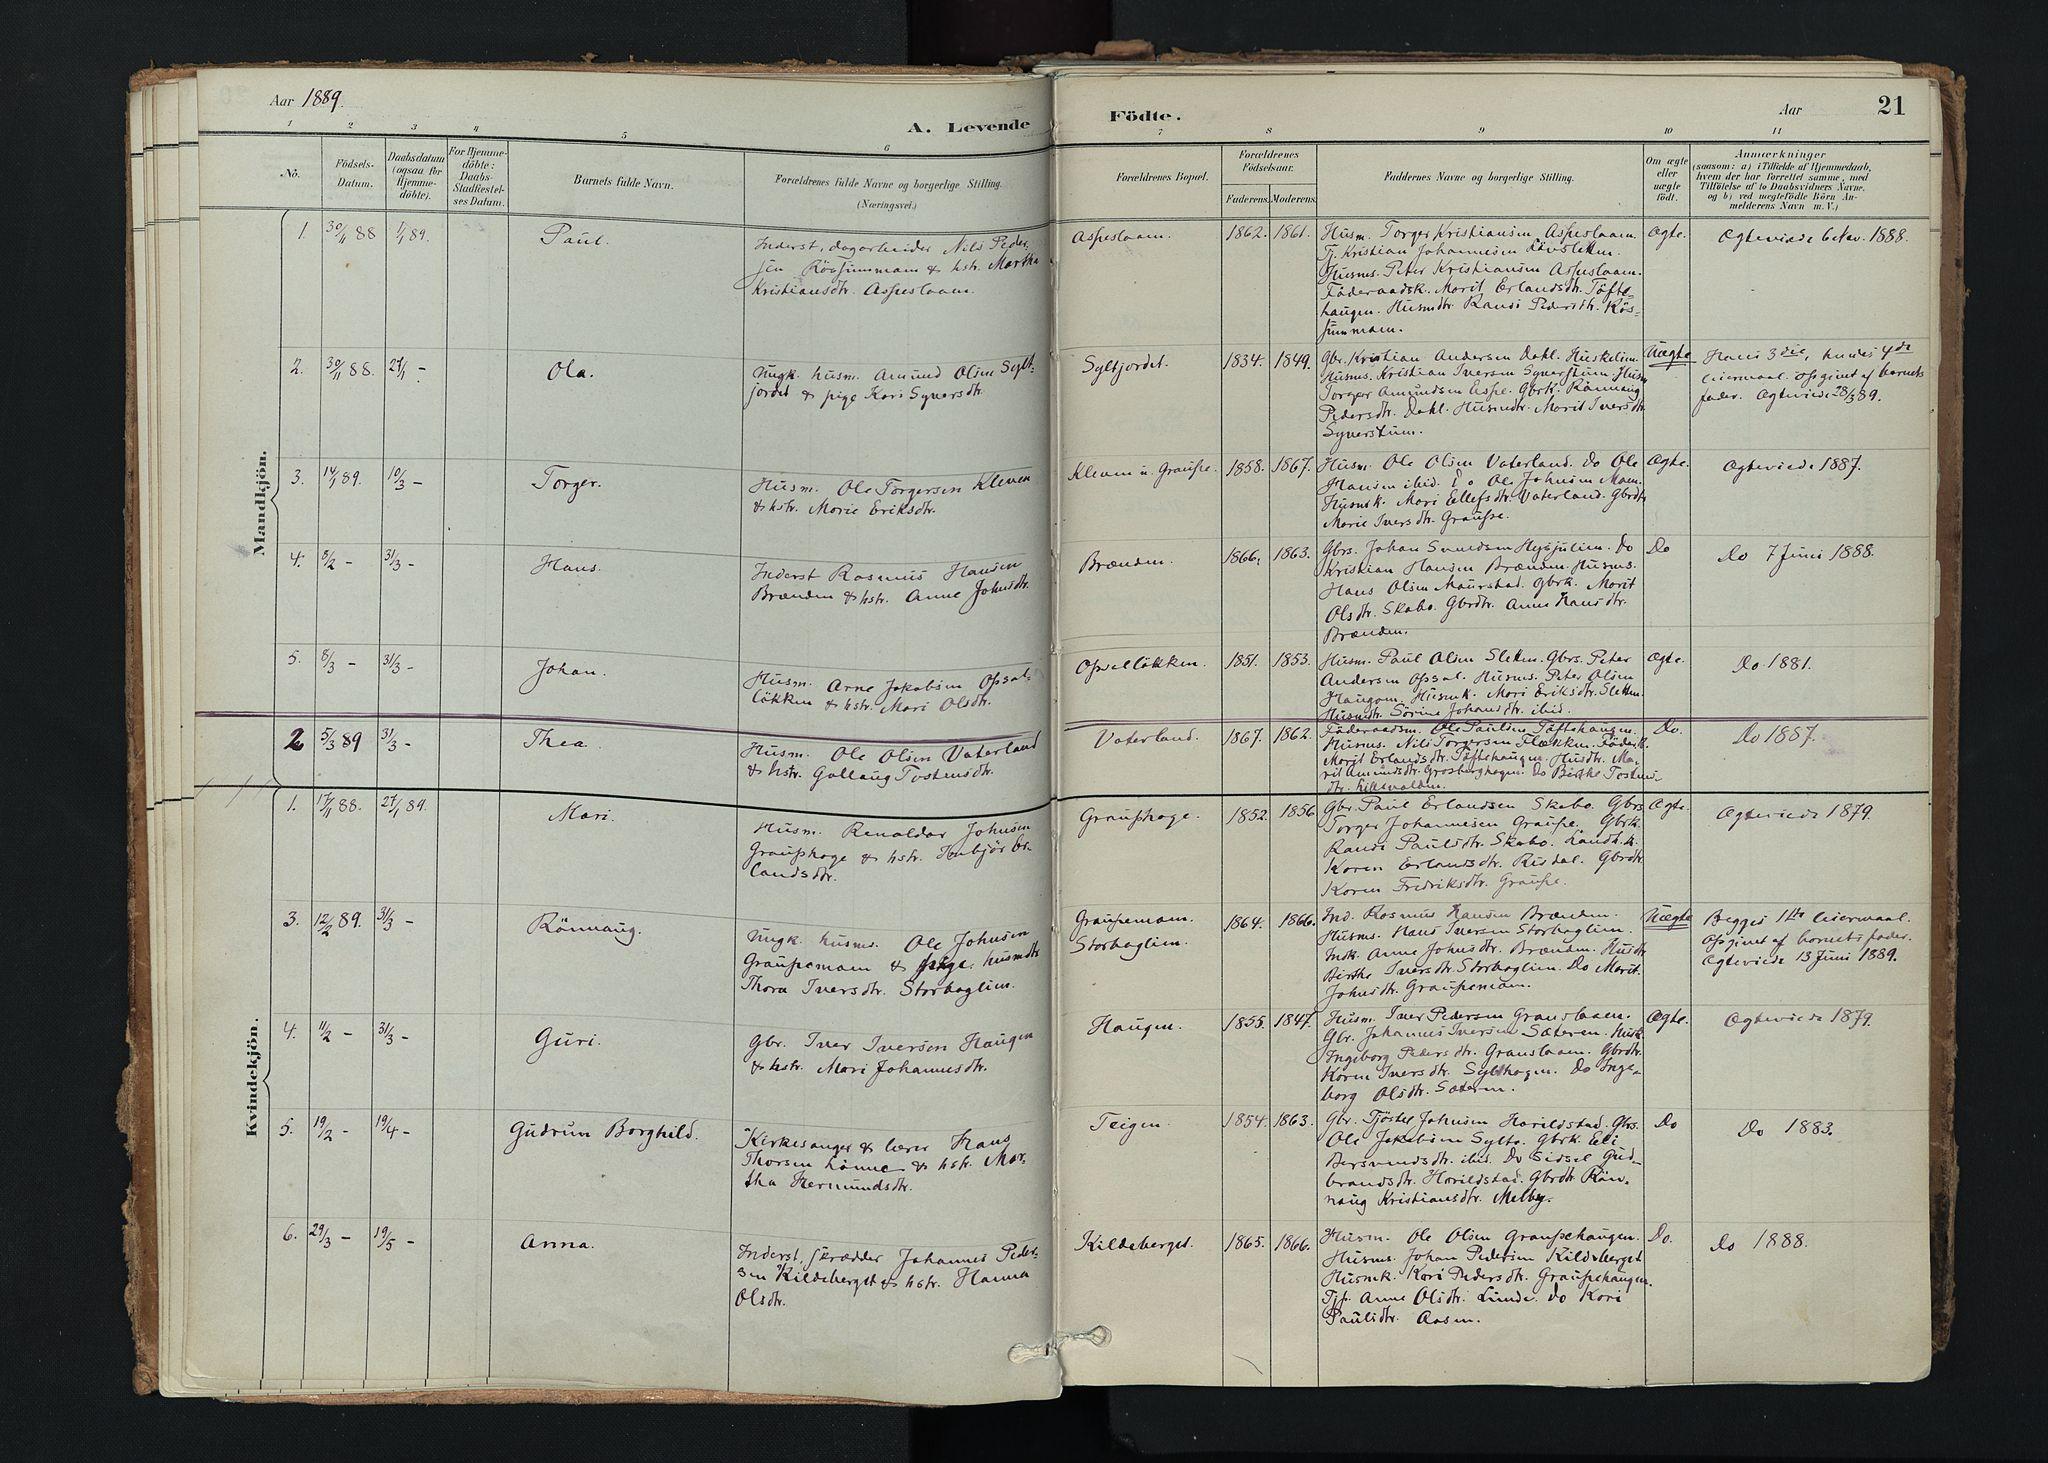 SAH, Nord-Fron prestekontor, Ministerialbok nr. 5, 1884-1914, s. 21